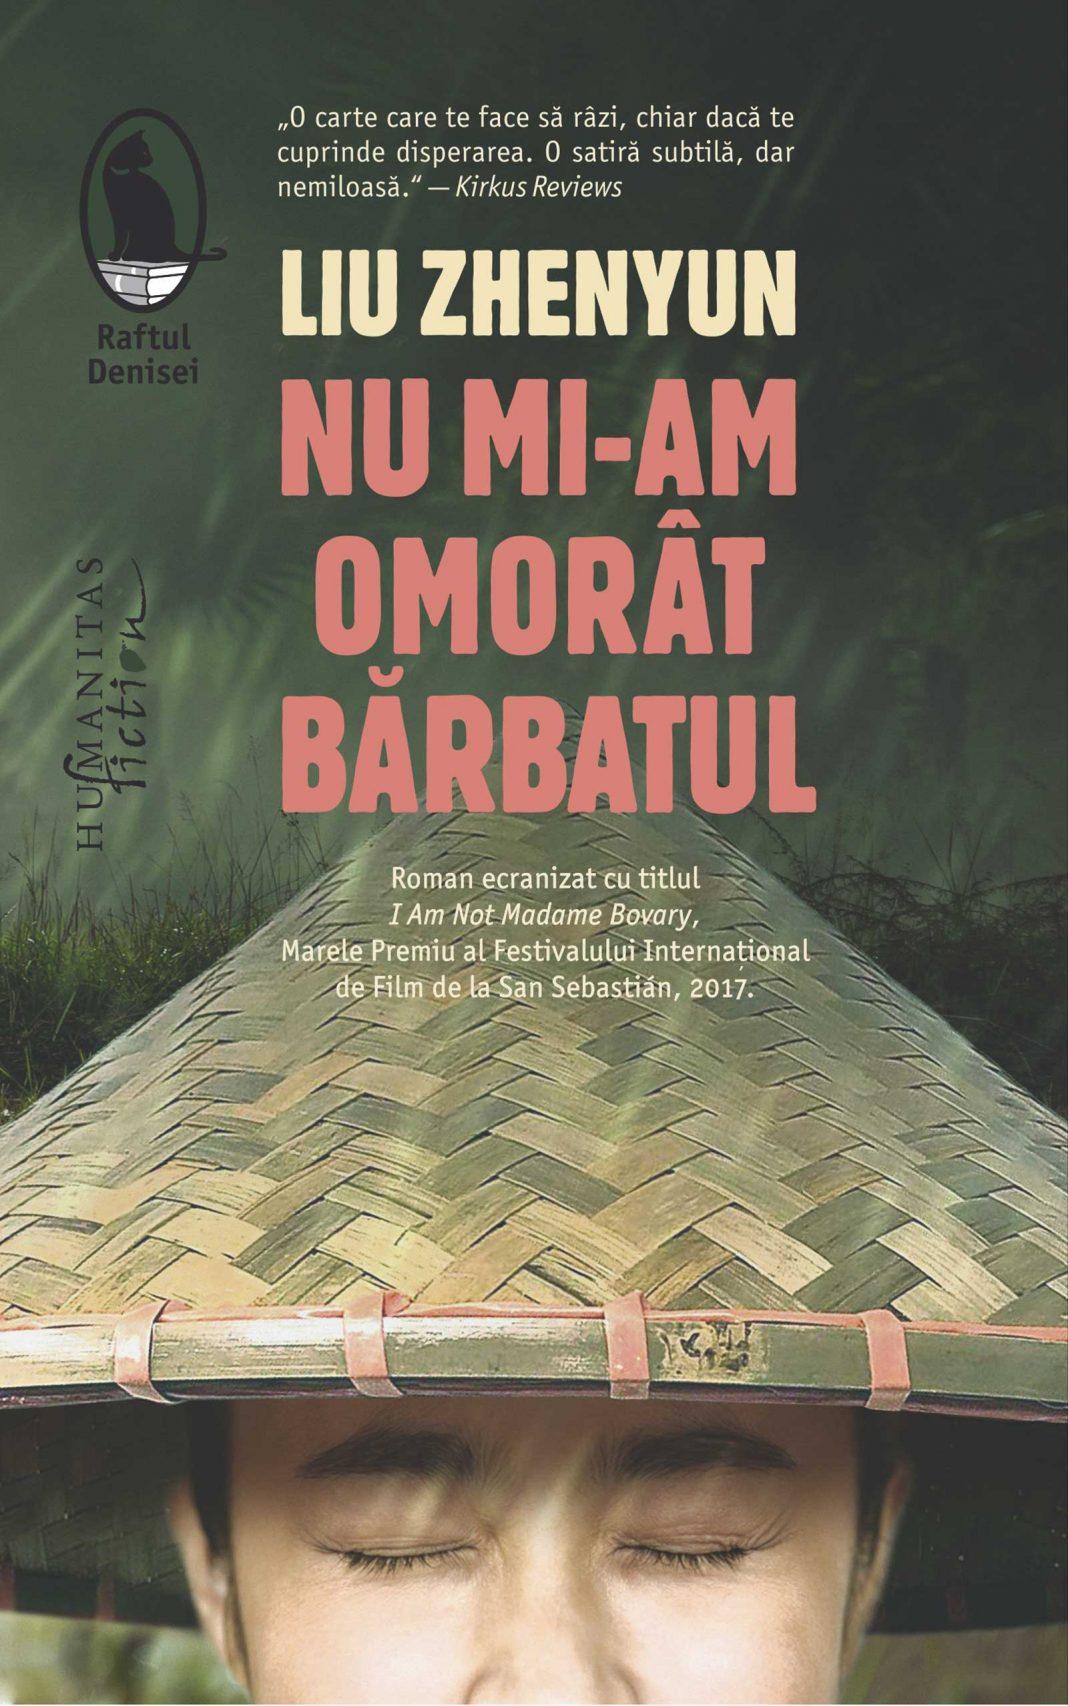 Liu Zhenyun, Nu mi-am omorât bărbatul, traducere și note de Luminița Bălan, Editura Humanitas Fiction, 2019